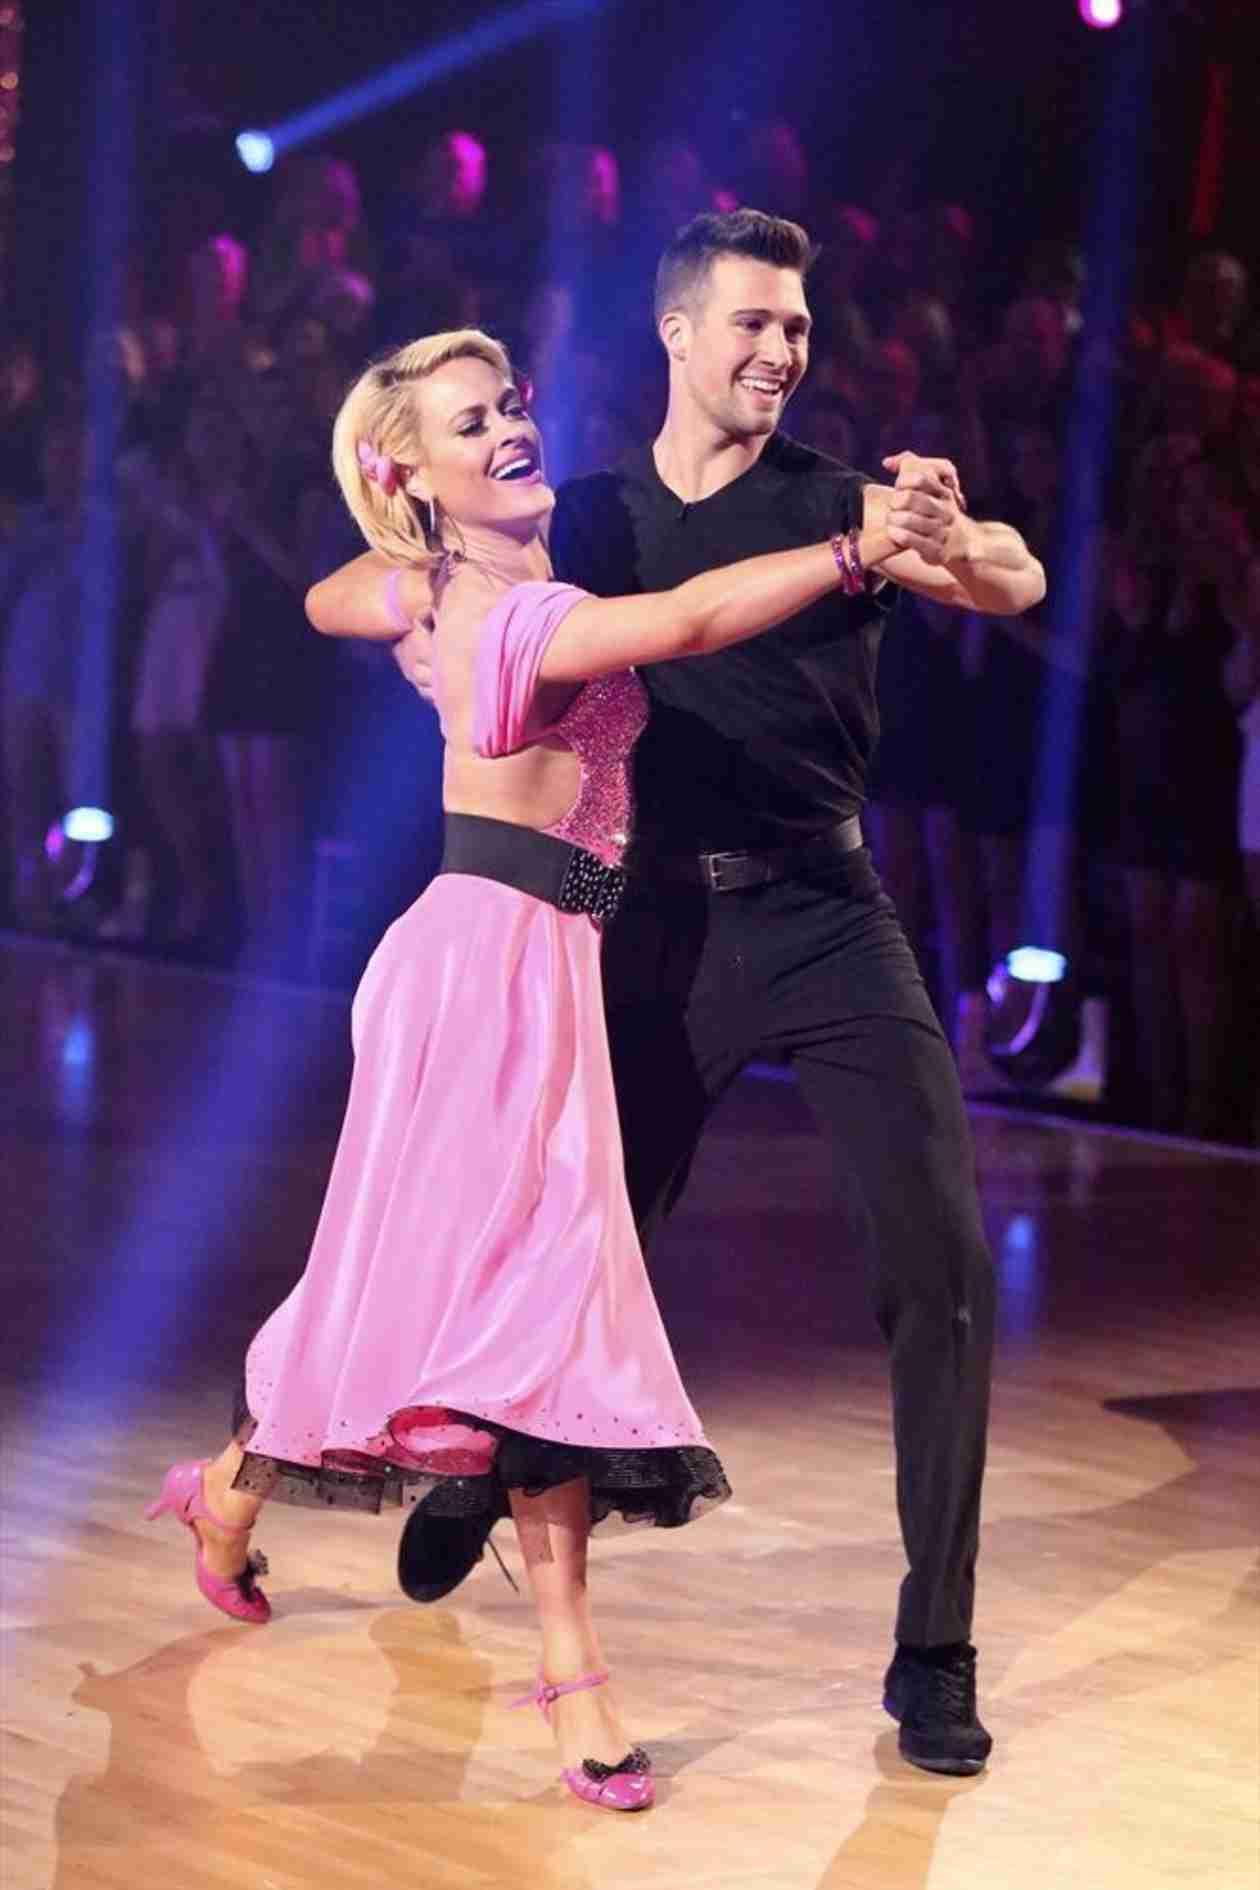 Dancing With the Stars 2014: James Maslow and Peta Murgatroyd's Week 9 Cha-Cha-Cha (VIDEO)